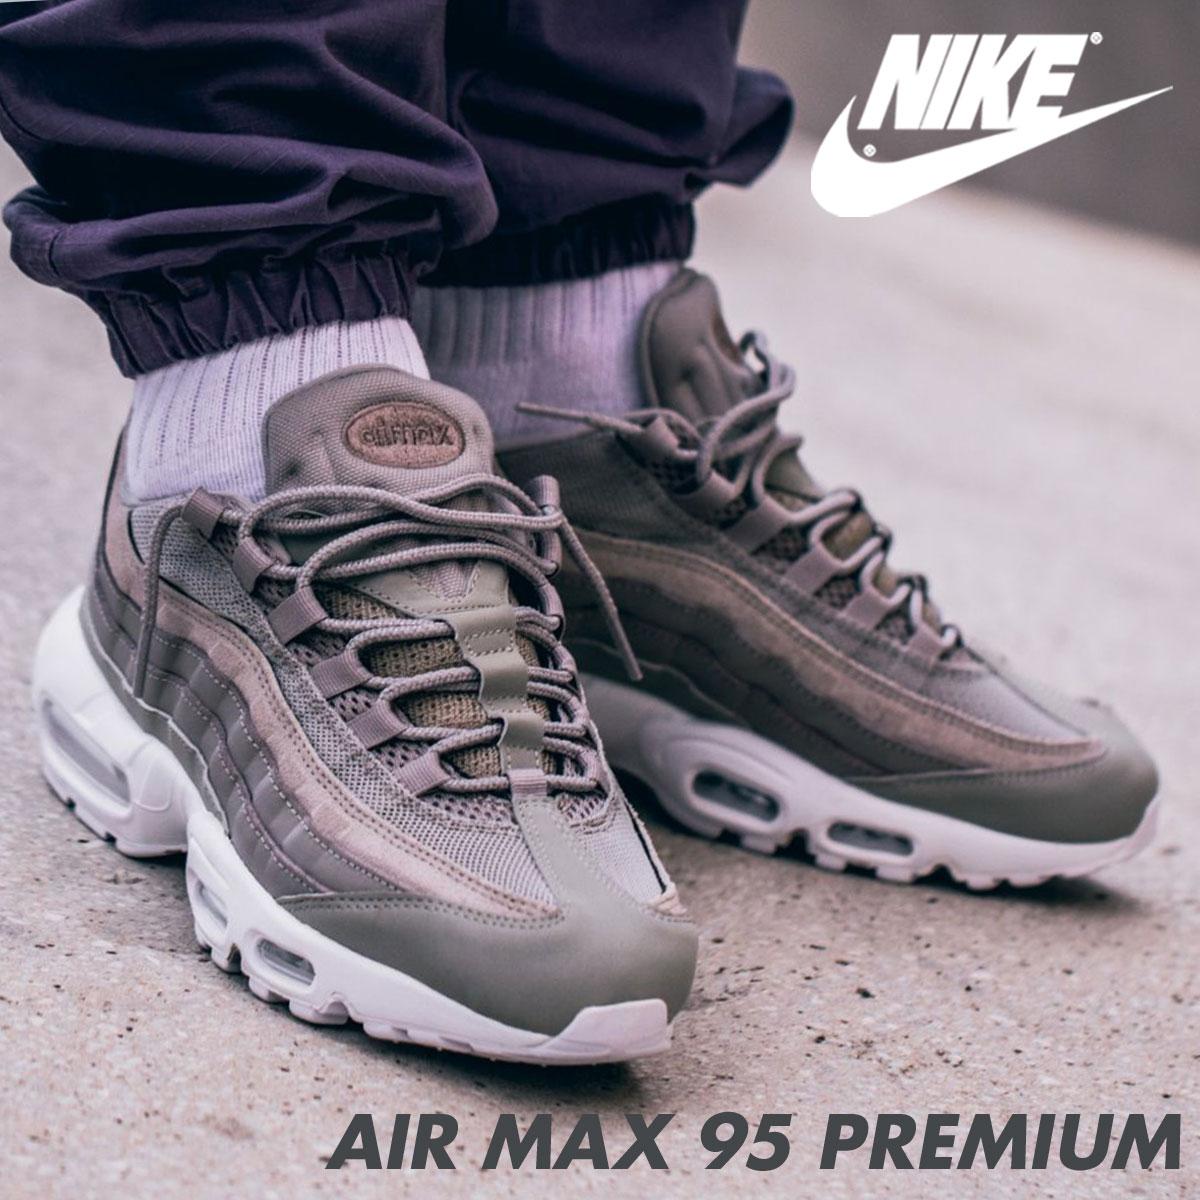 new product dea43 9f2a1 ... Nike NIKE Air Max 95 sneakers AIR MAX 95 PREMIUM 538,416-005 men's shoes  gray ...